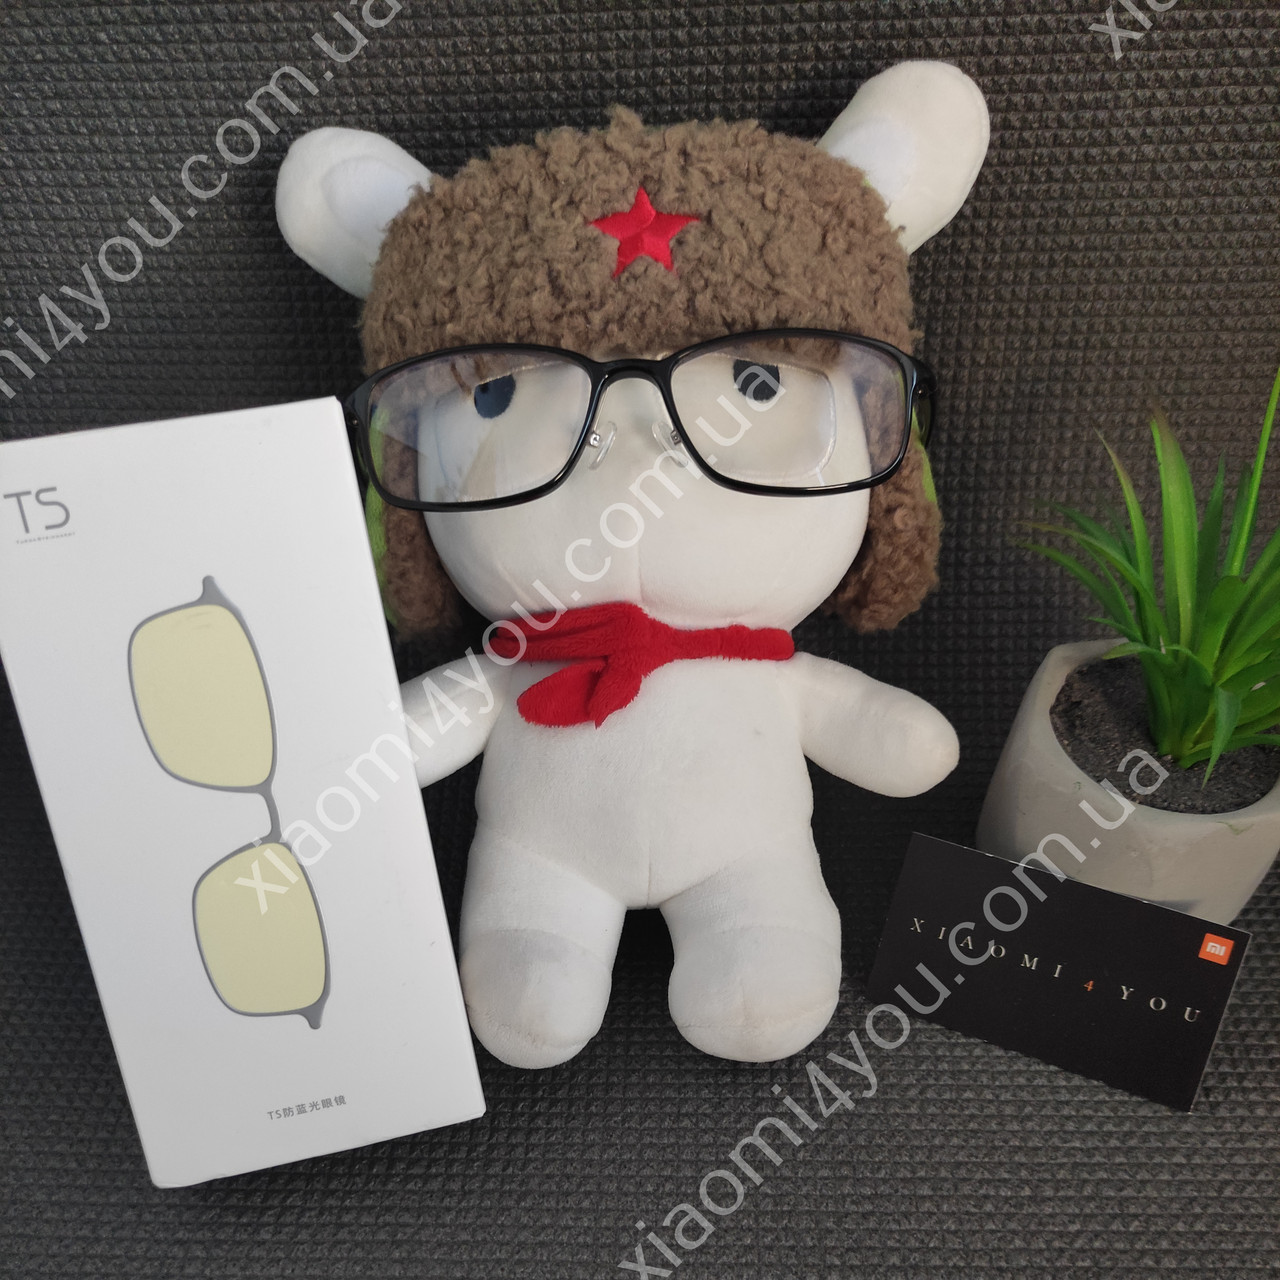 Компьютерные очки Xiaomi TS Turok Steinhard Anti-blue Glasses